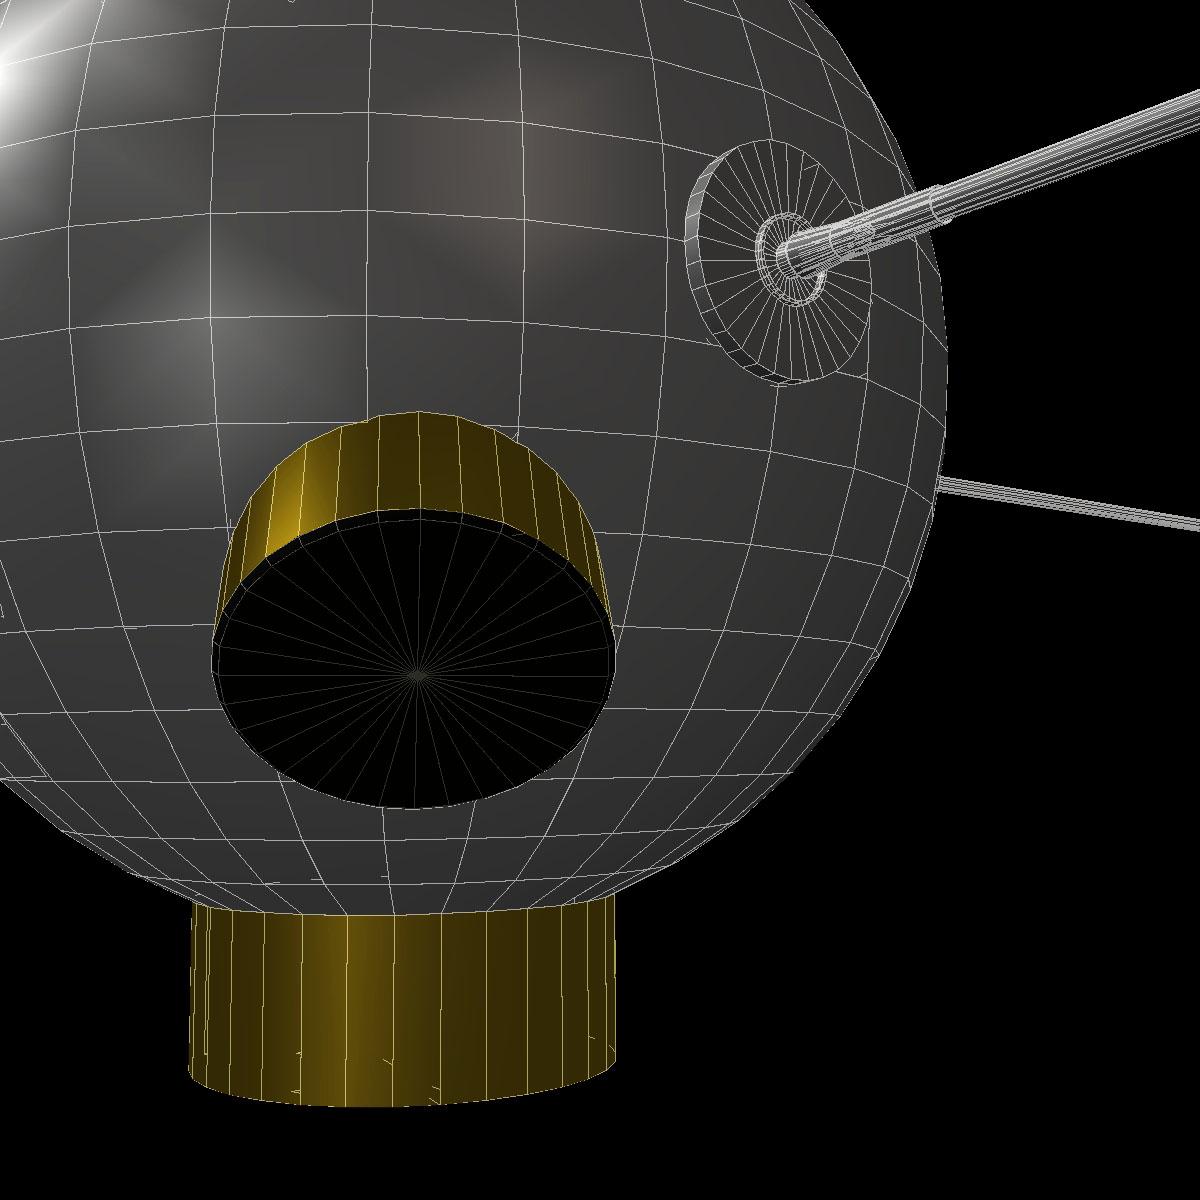 avangard ii satelit 3d model 3ds dxf fbx mješavina cob dae x obj 163945